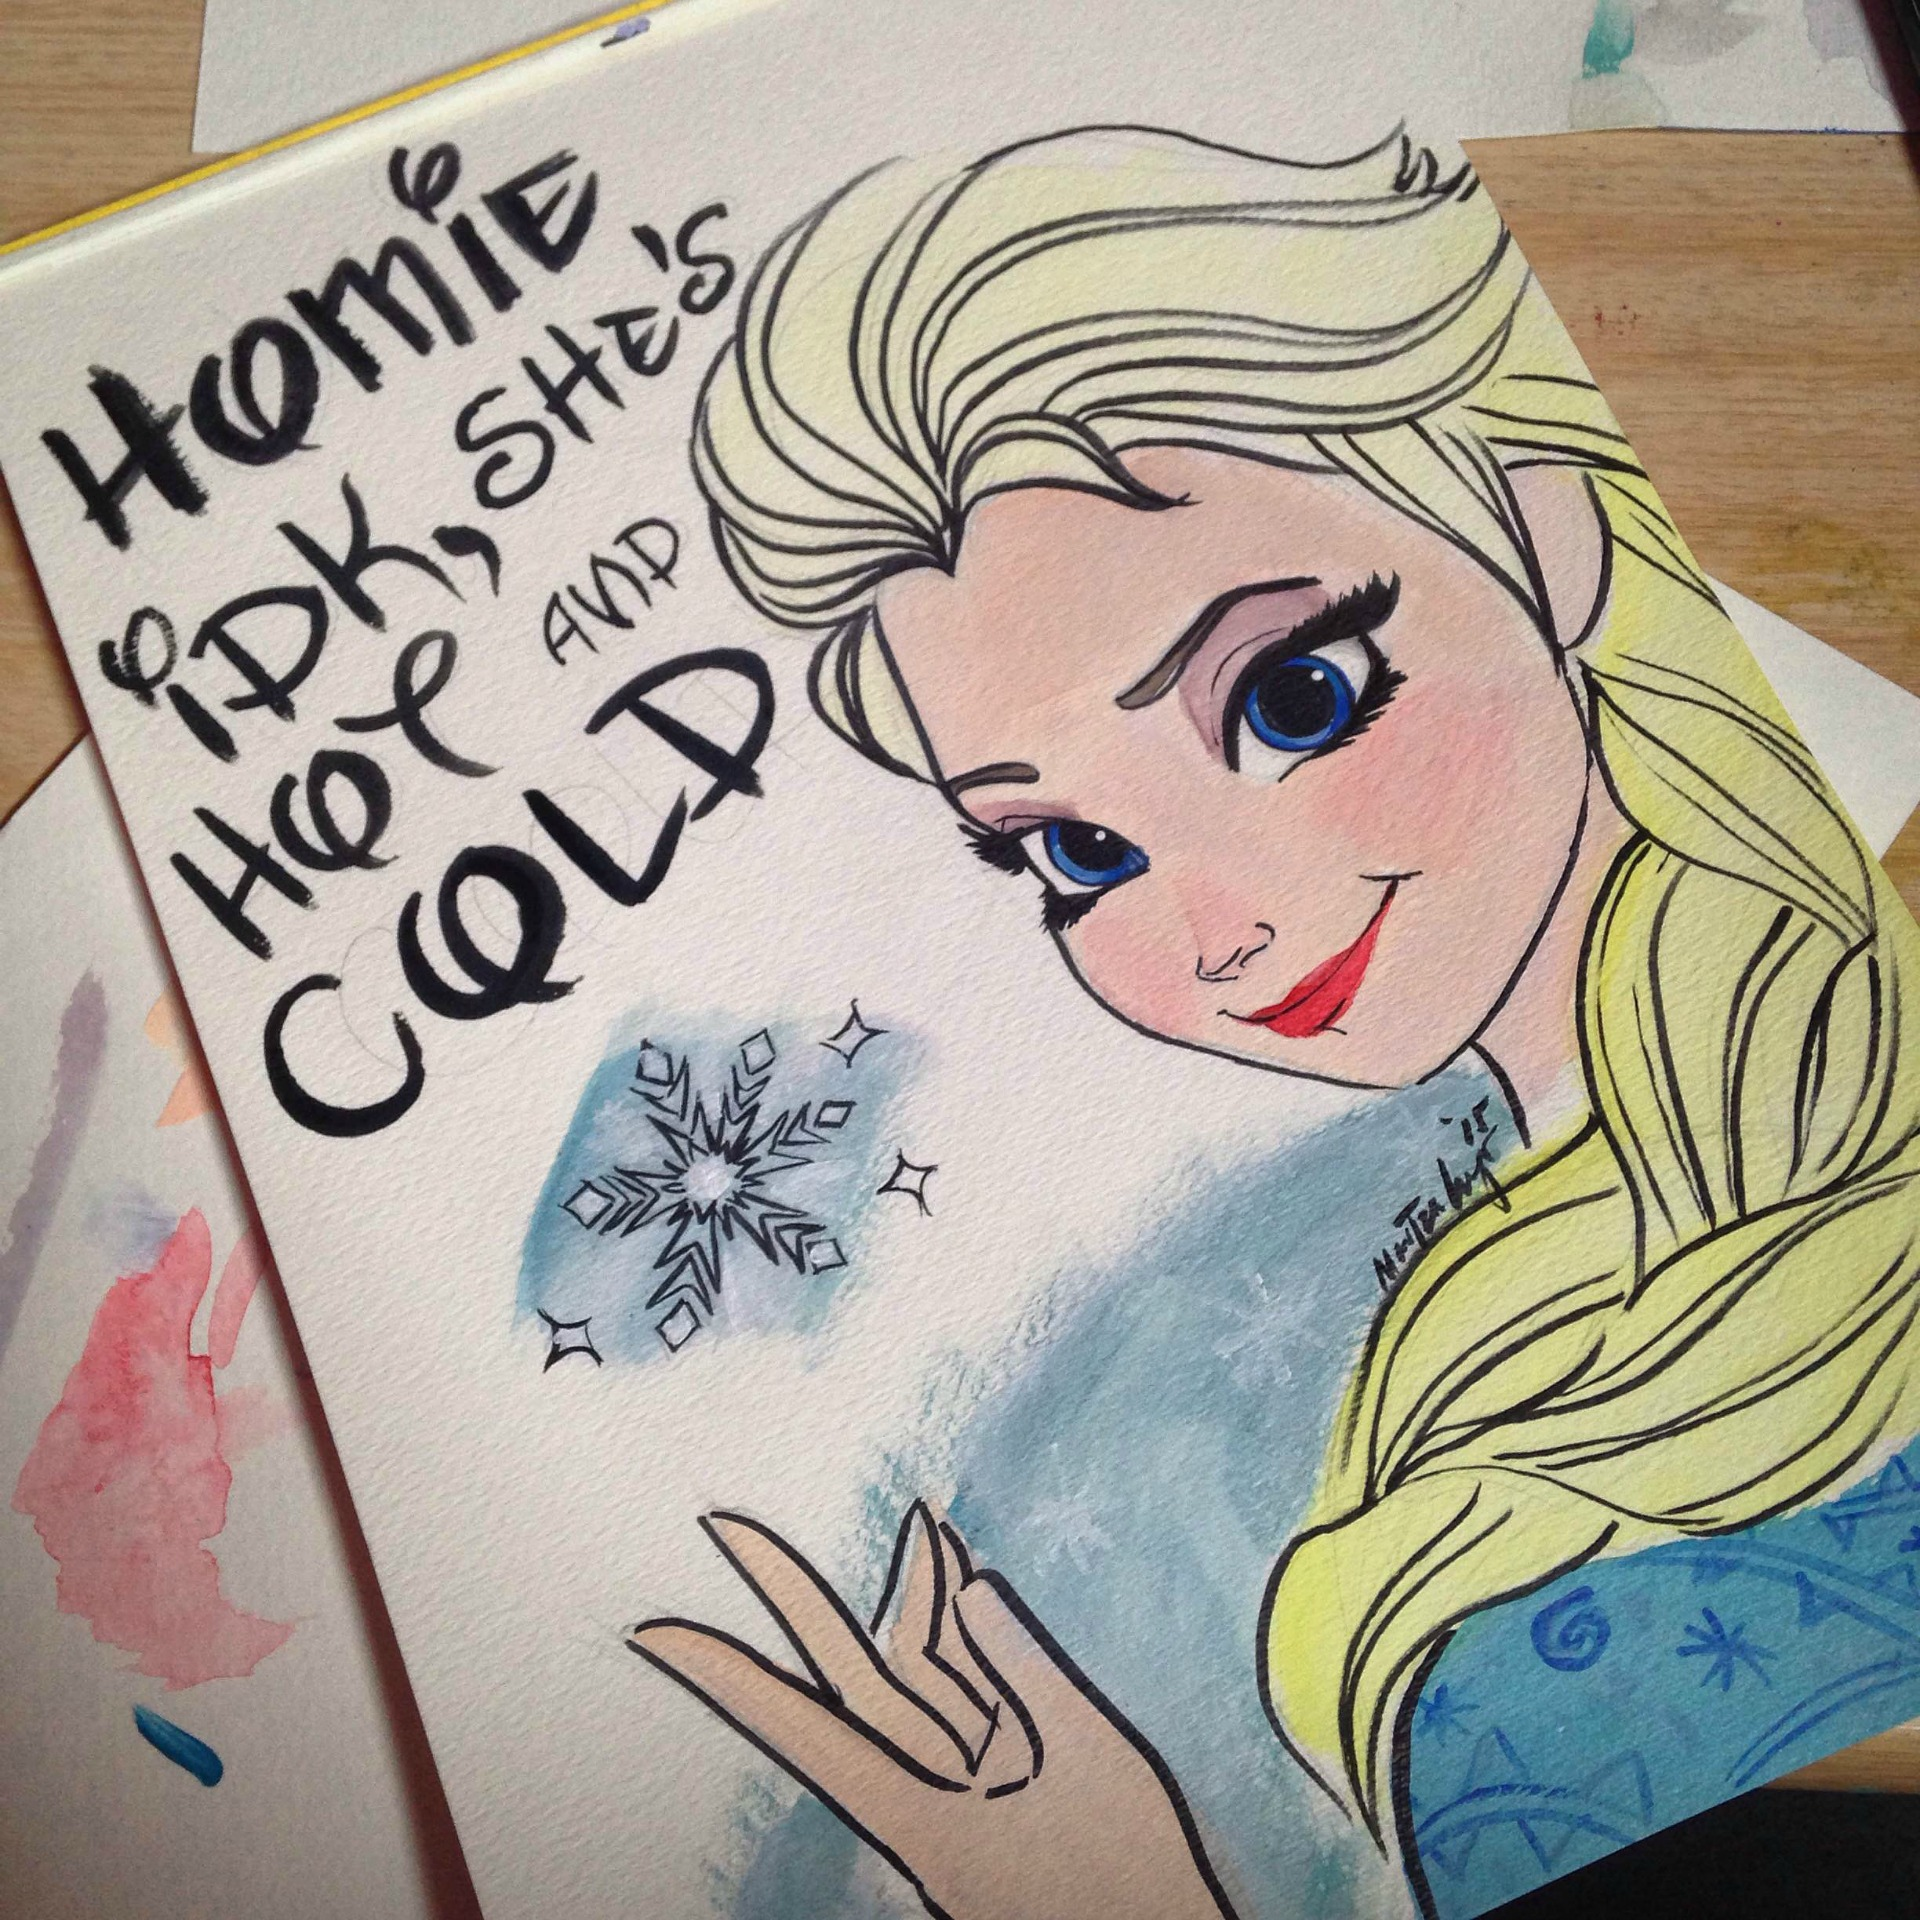 Artist creates Disney princess illustrations with Kanye West lyrics